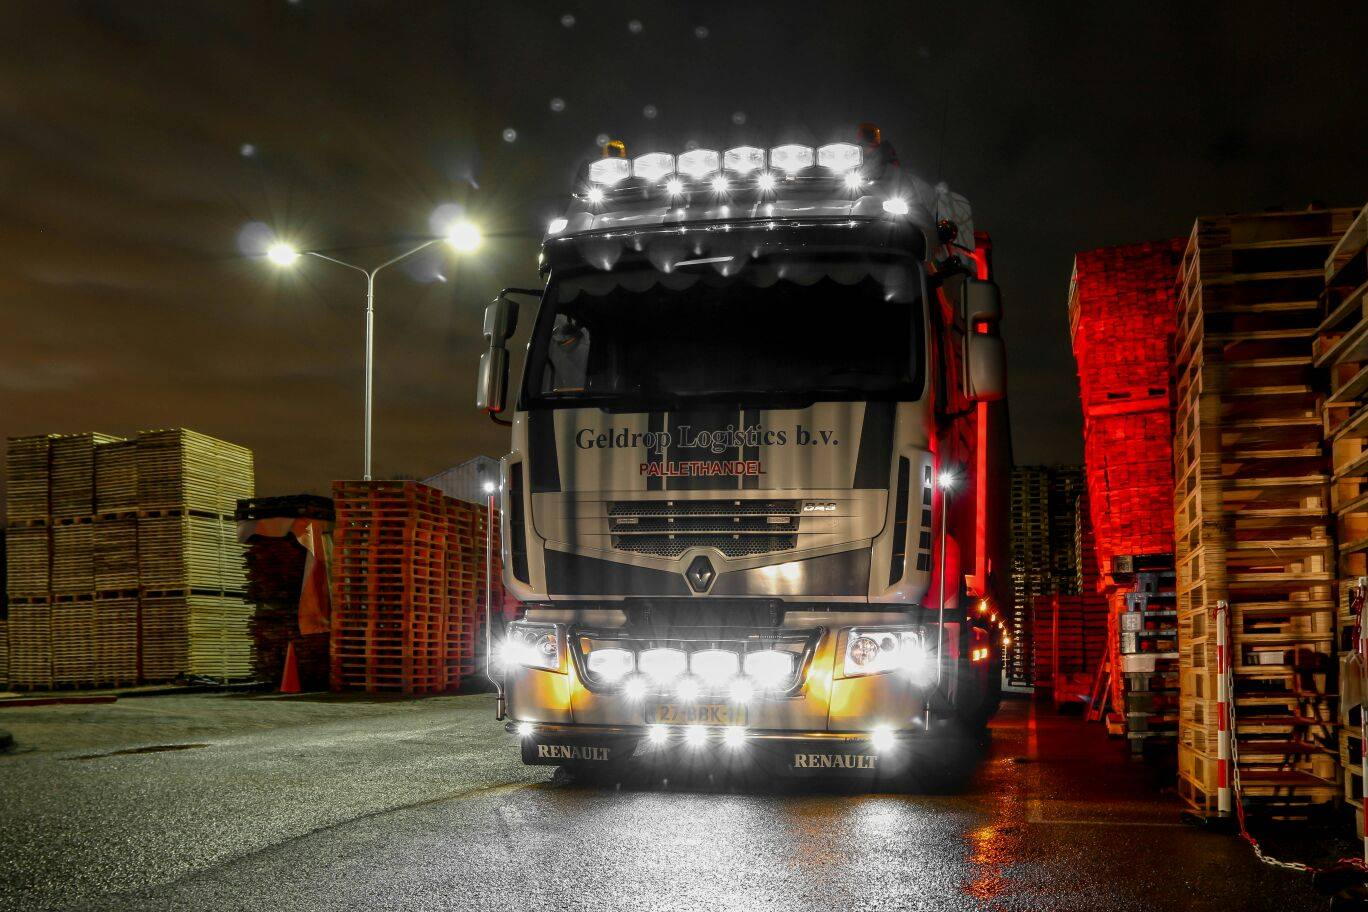 Geldrop Logistics